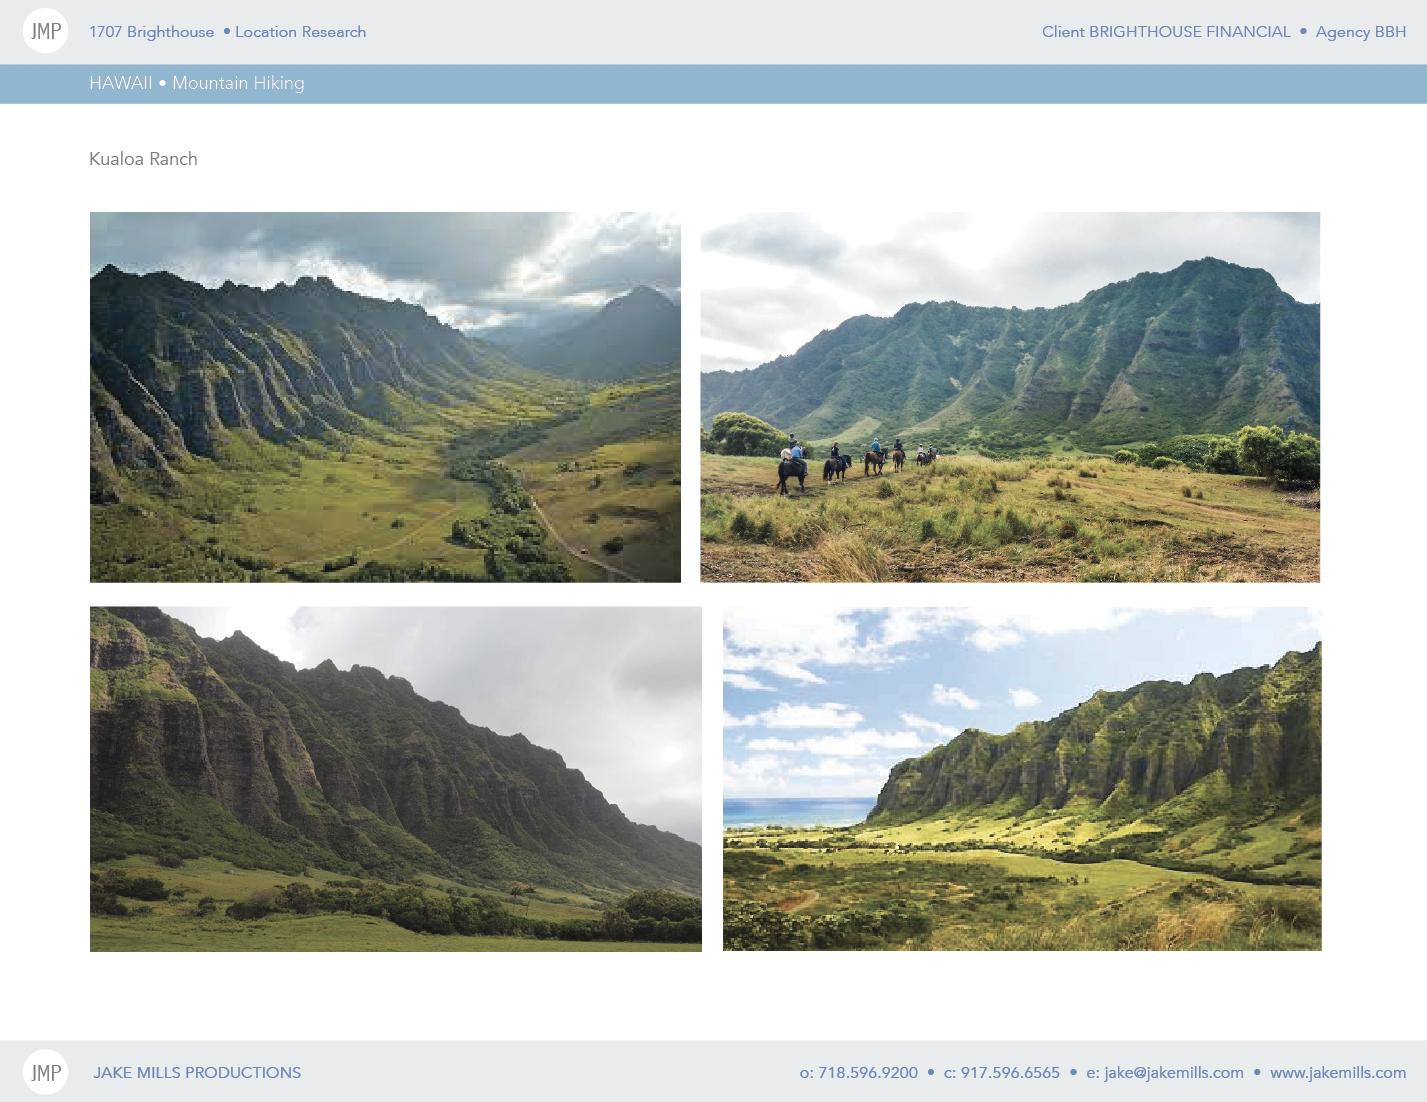 We needed production-friendly access. Kualoa Ranch, Oahu, was perfect.